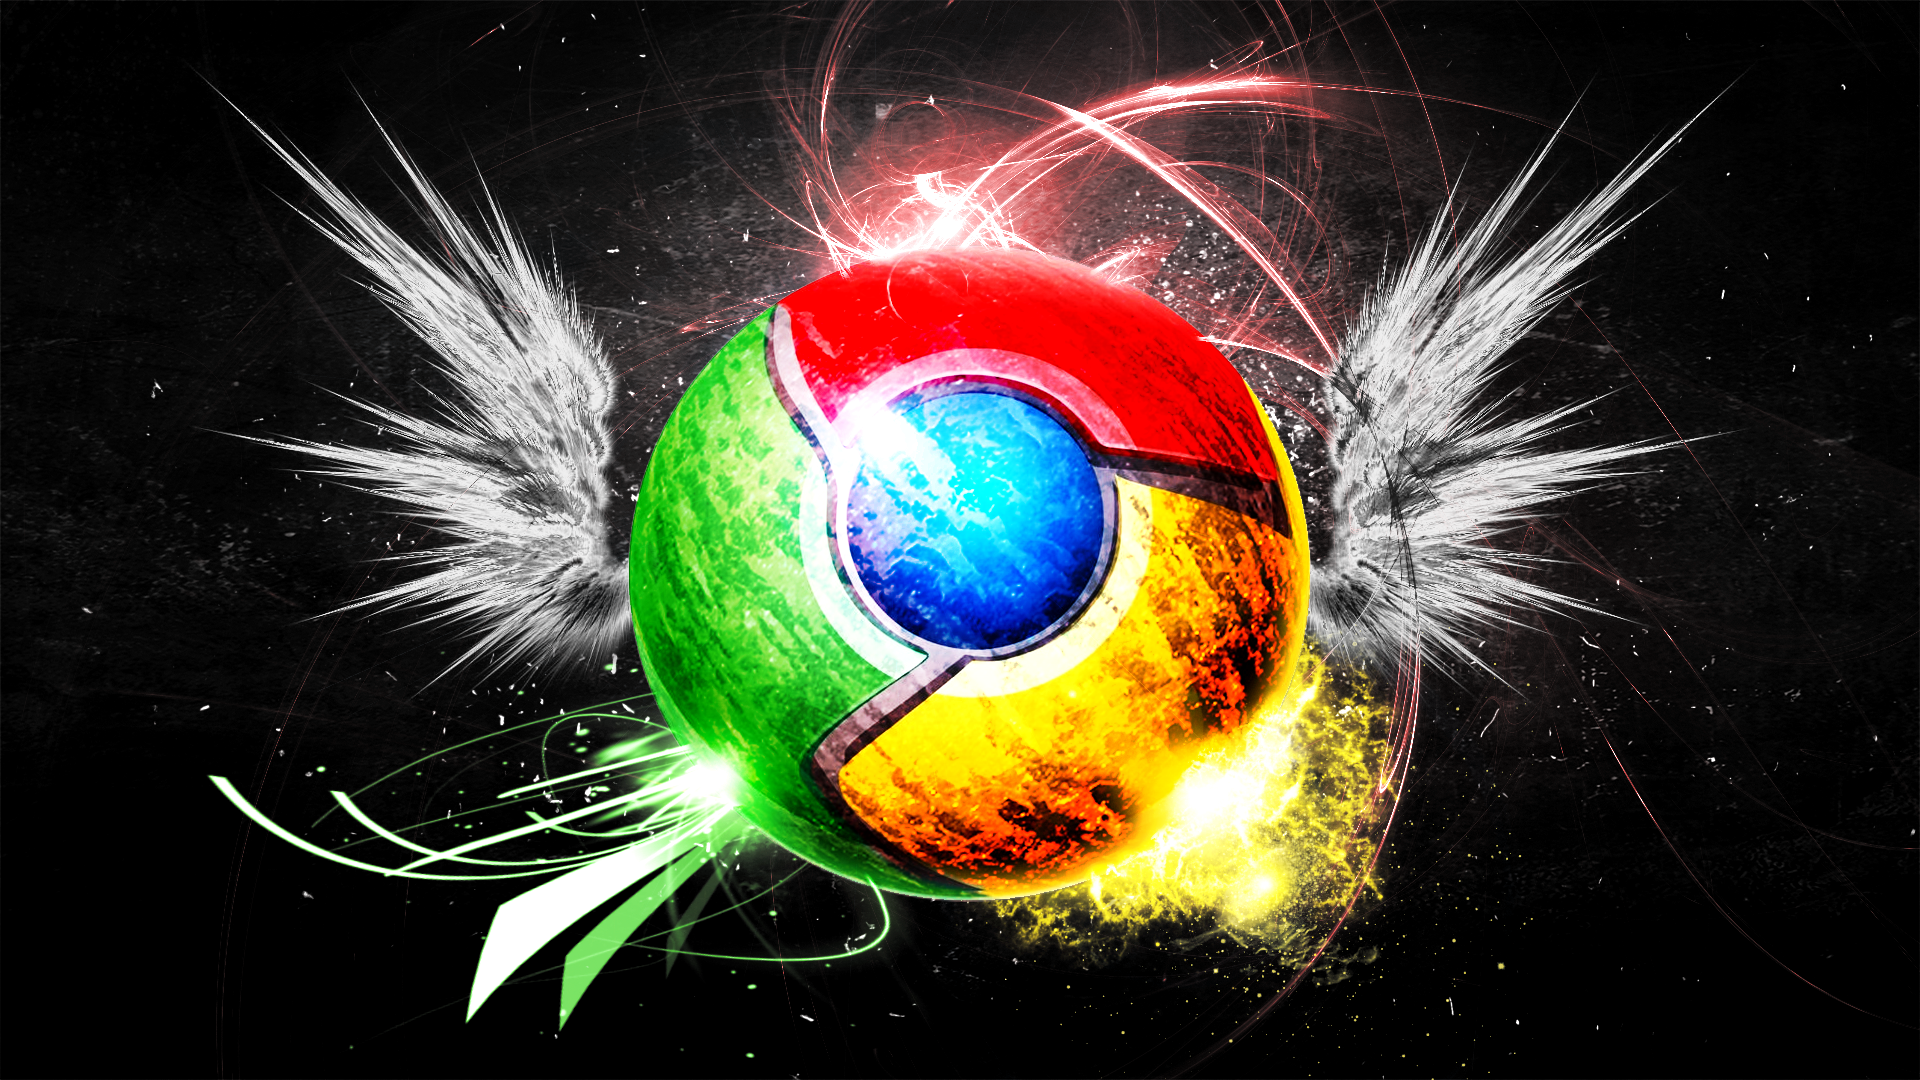 Artistic Google Chrome Wallpaper